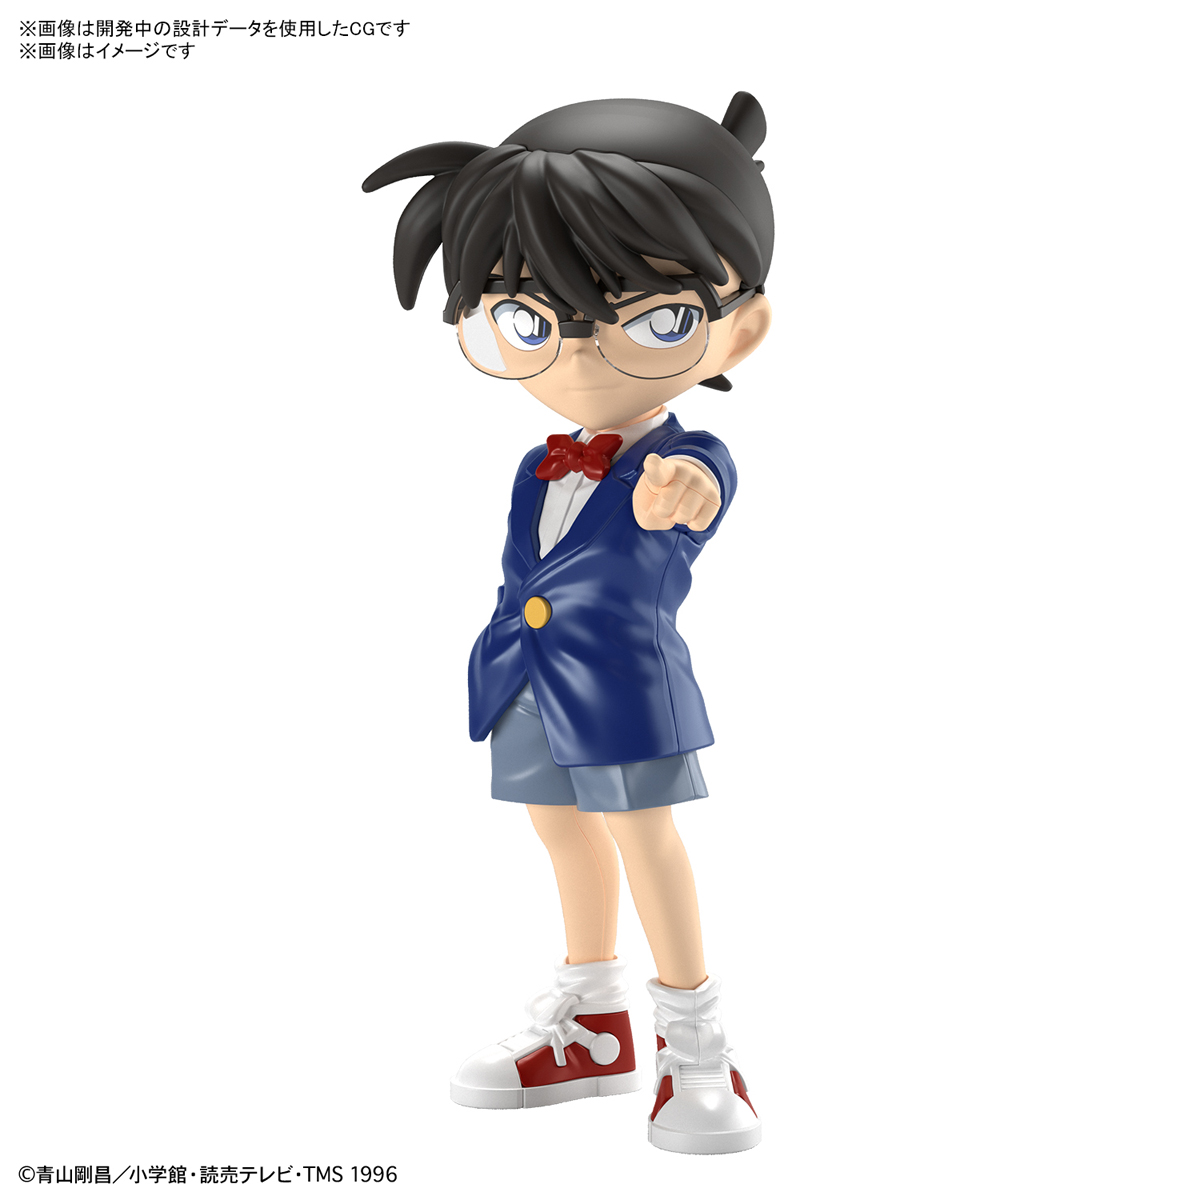 ENTRY GRADE『江戸川コナン』名探偵コナン プラモデル-001